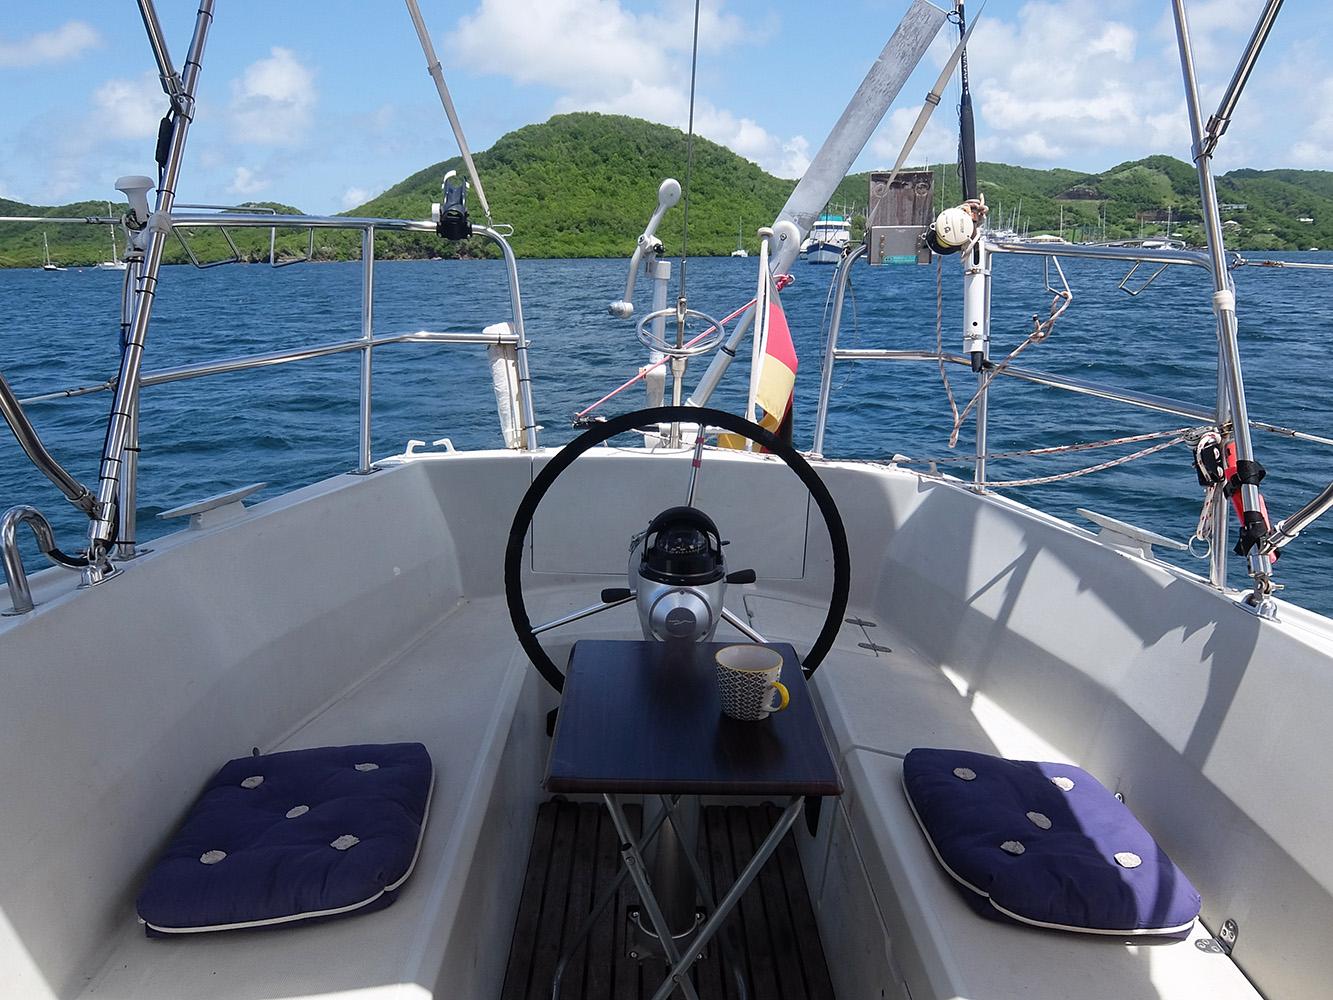 Grenada, Woburn Bay, Sail boat.